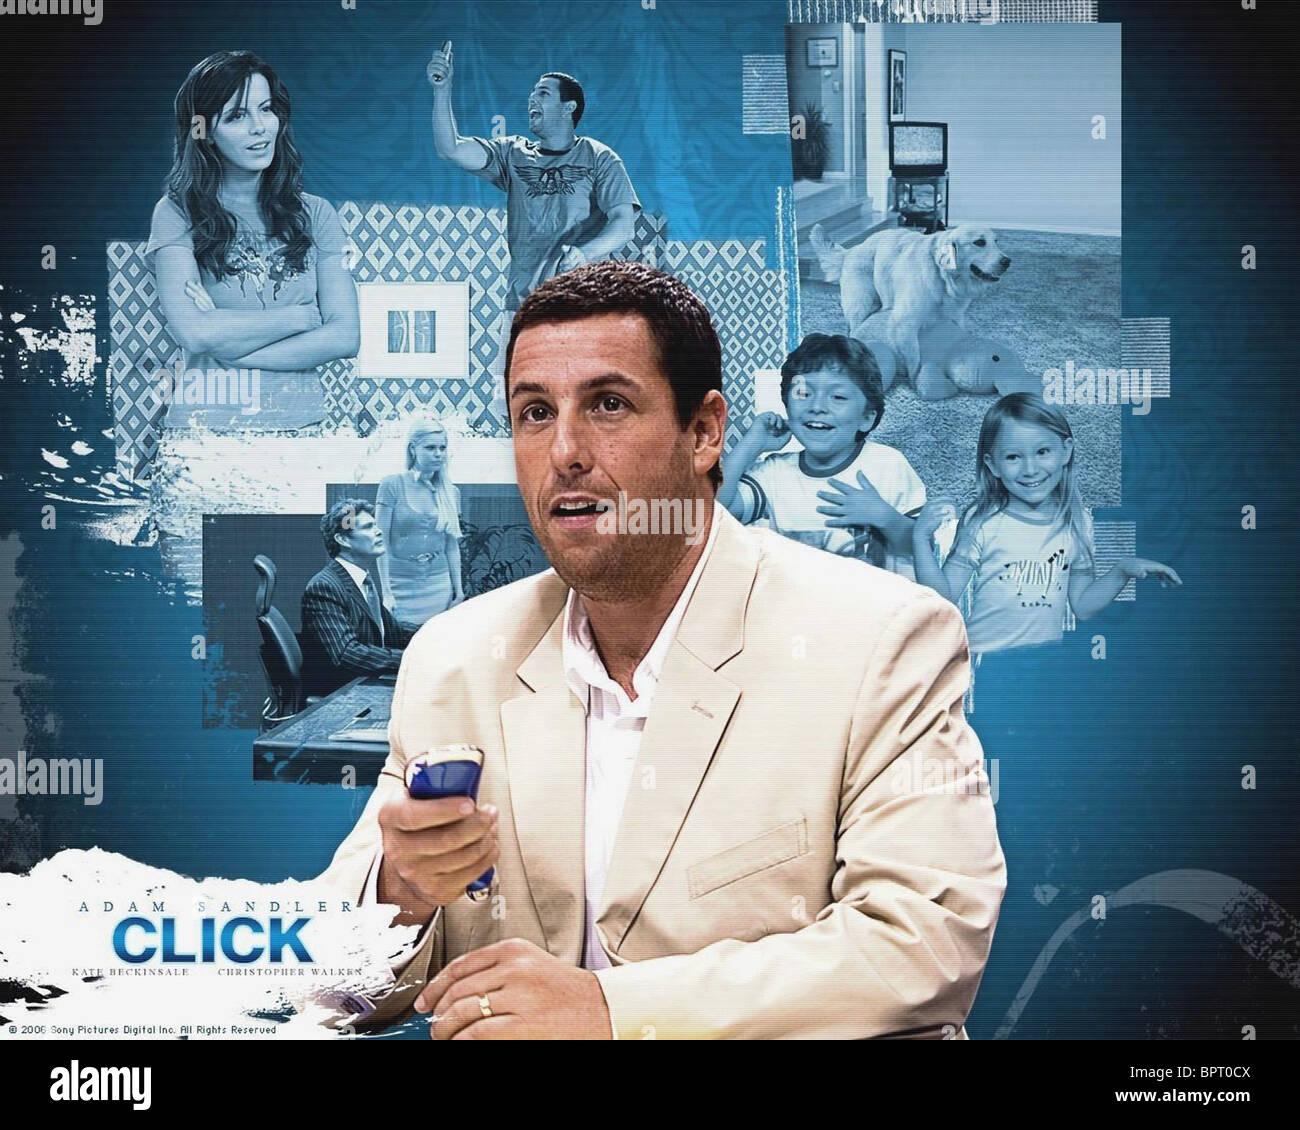 Adam Sandler Poster Click 2006 Stock Photo Alamy